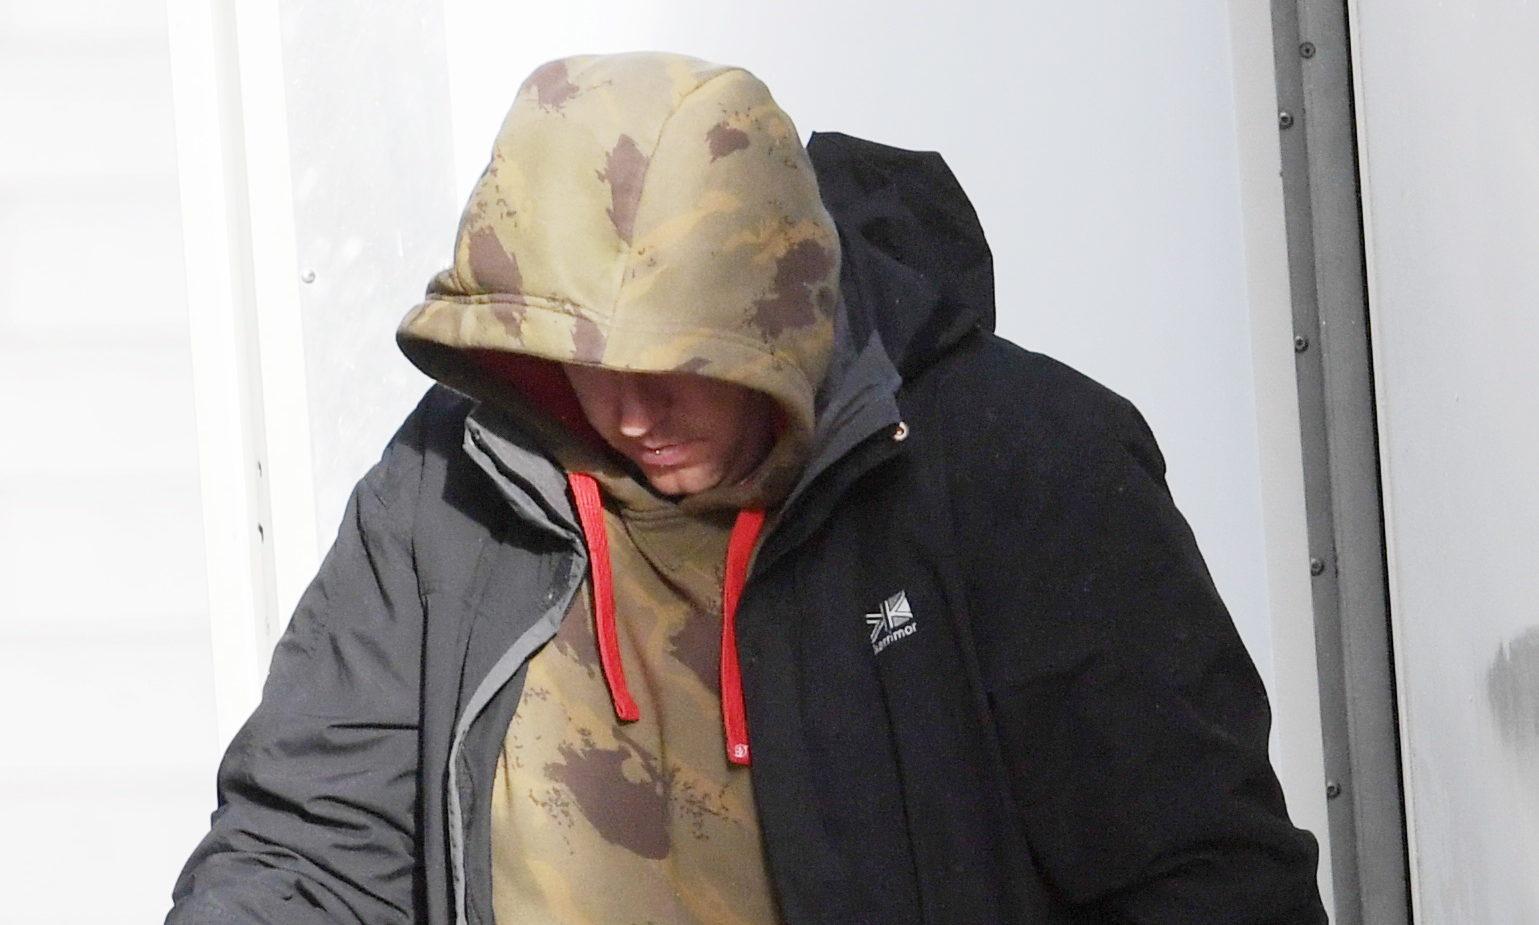 Michael Scott pictured leaving court.